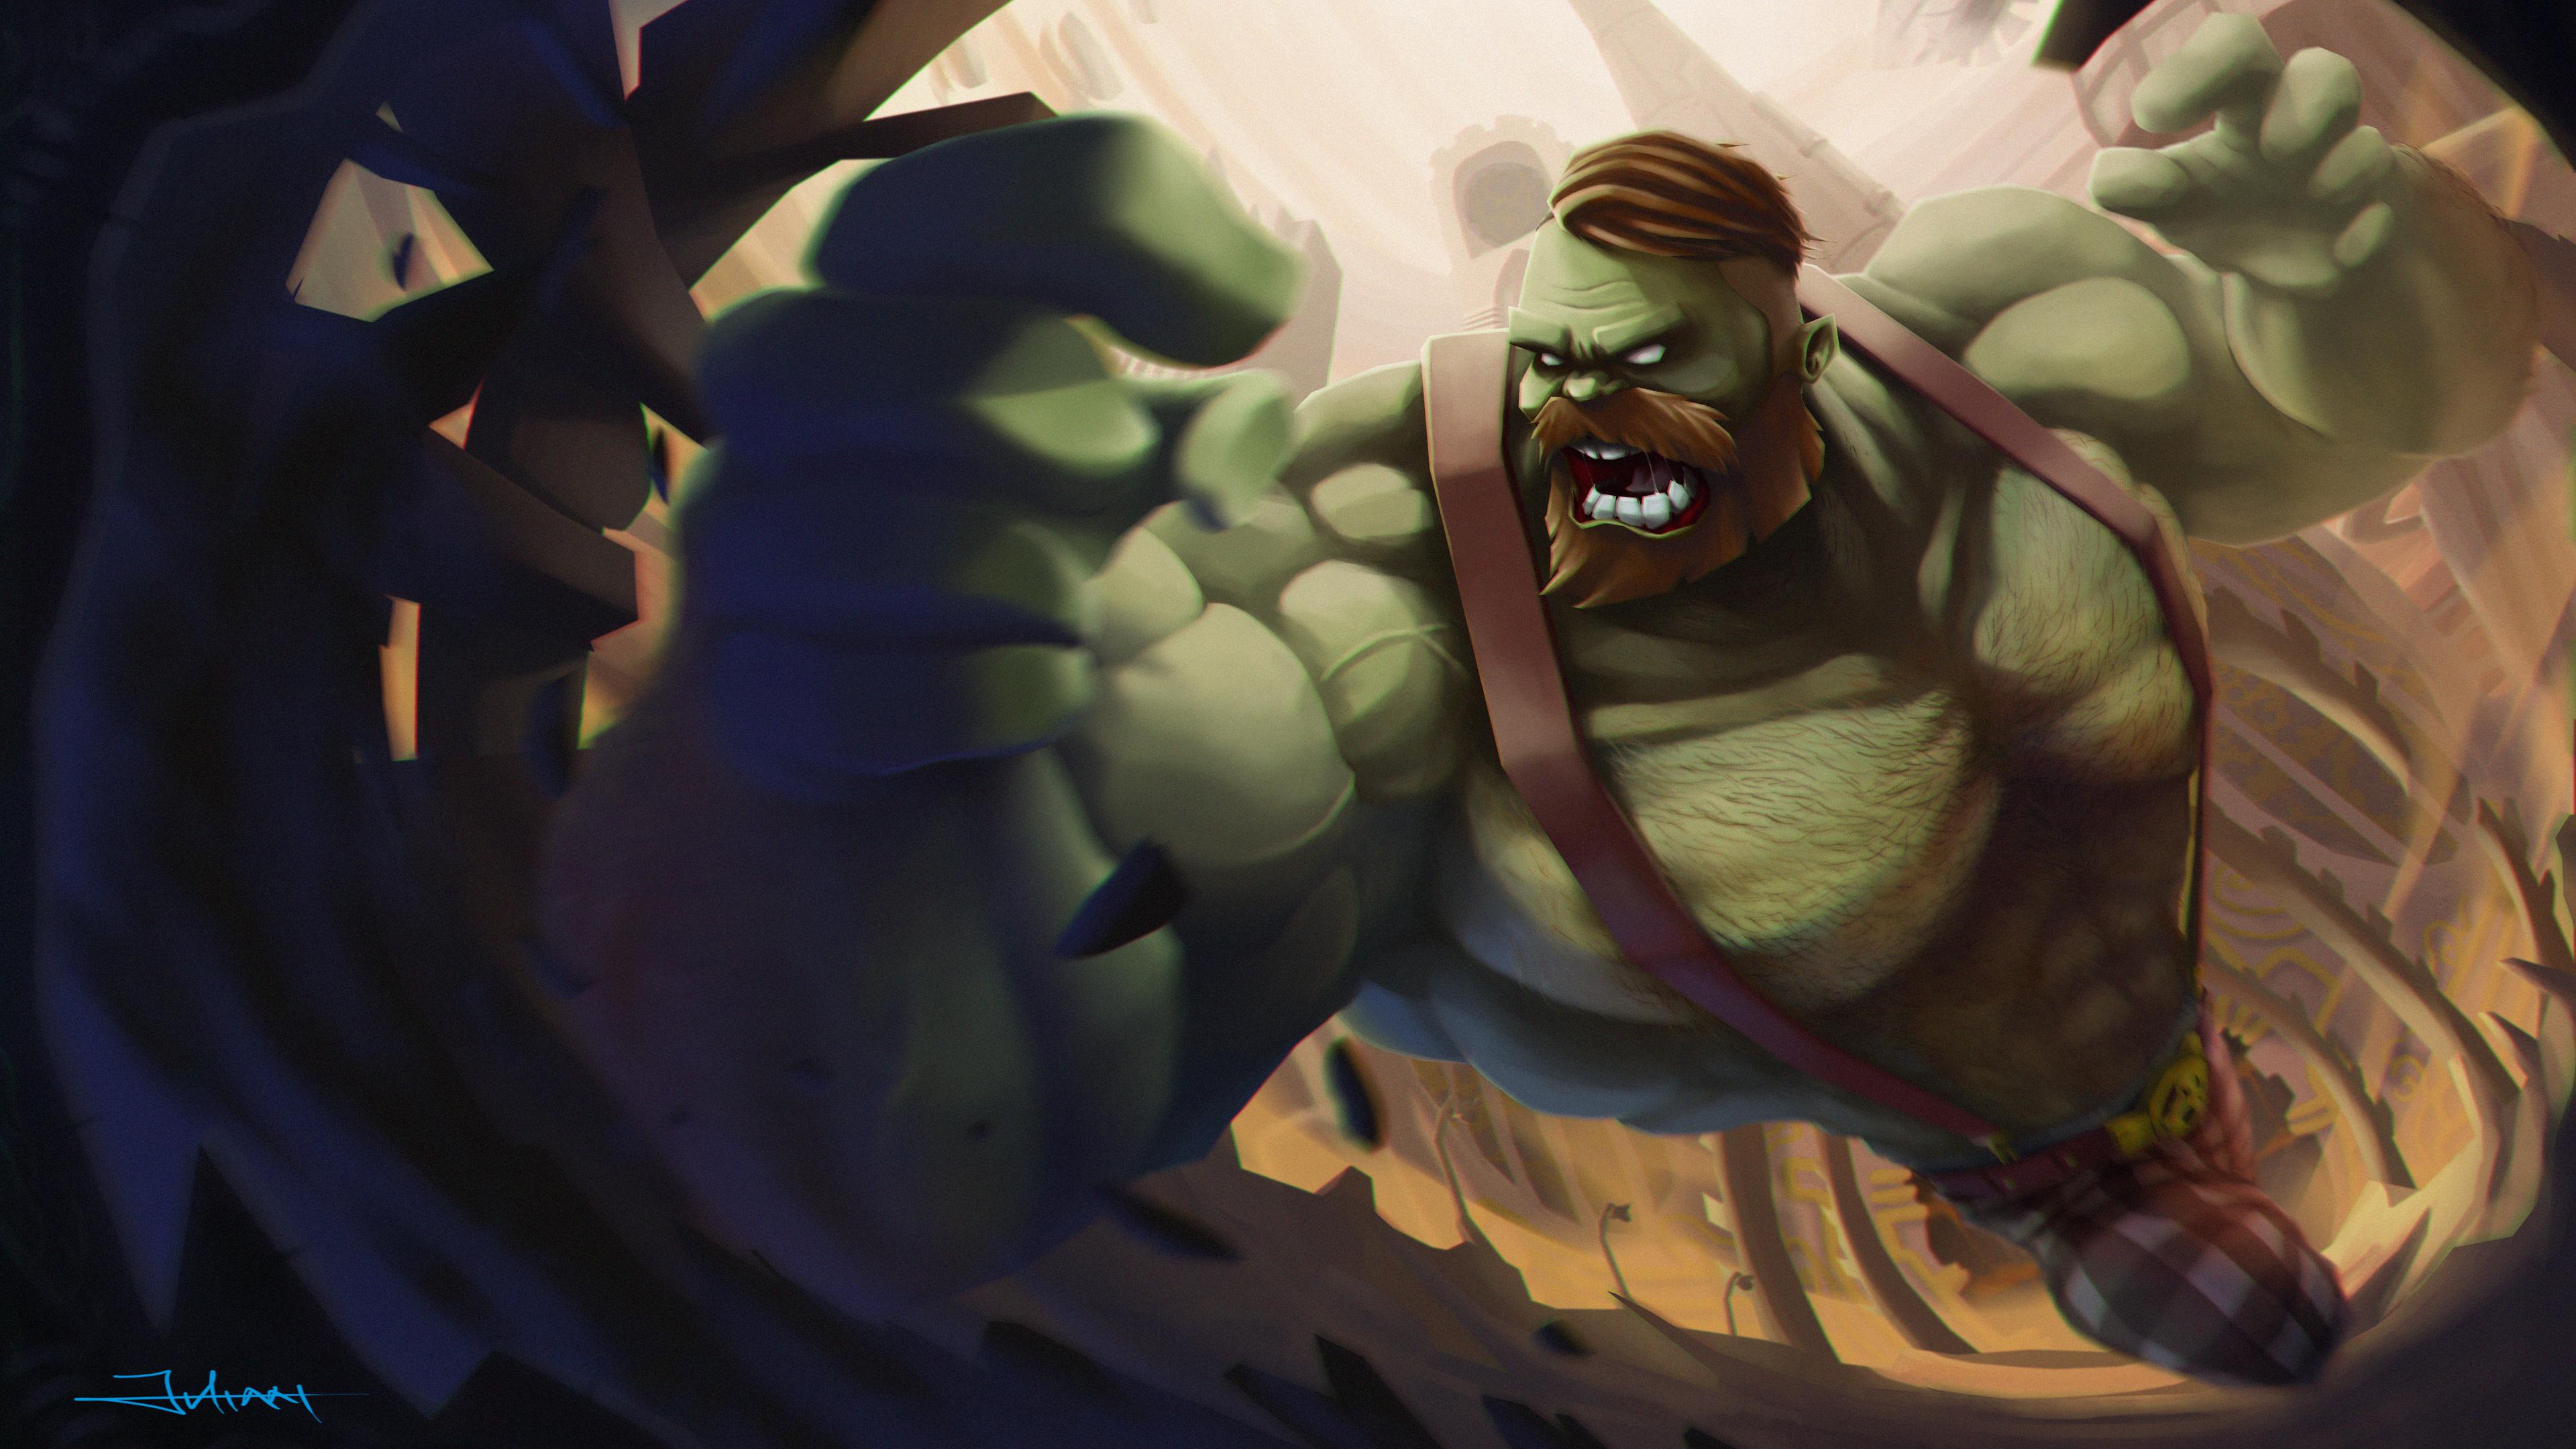 bearded steampunk hulk 1536522688 - Bearded Steampunk Hulk - hulk wallpapers, hd-wallpapers, digital art wallpapers, deviantart wallpapers, artwork wallpapers, artist wallpapers, 5k wallpapers, 4k-wallpapers